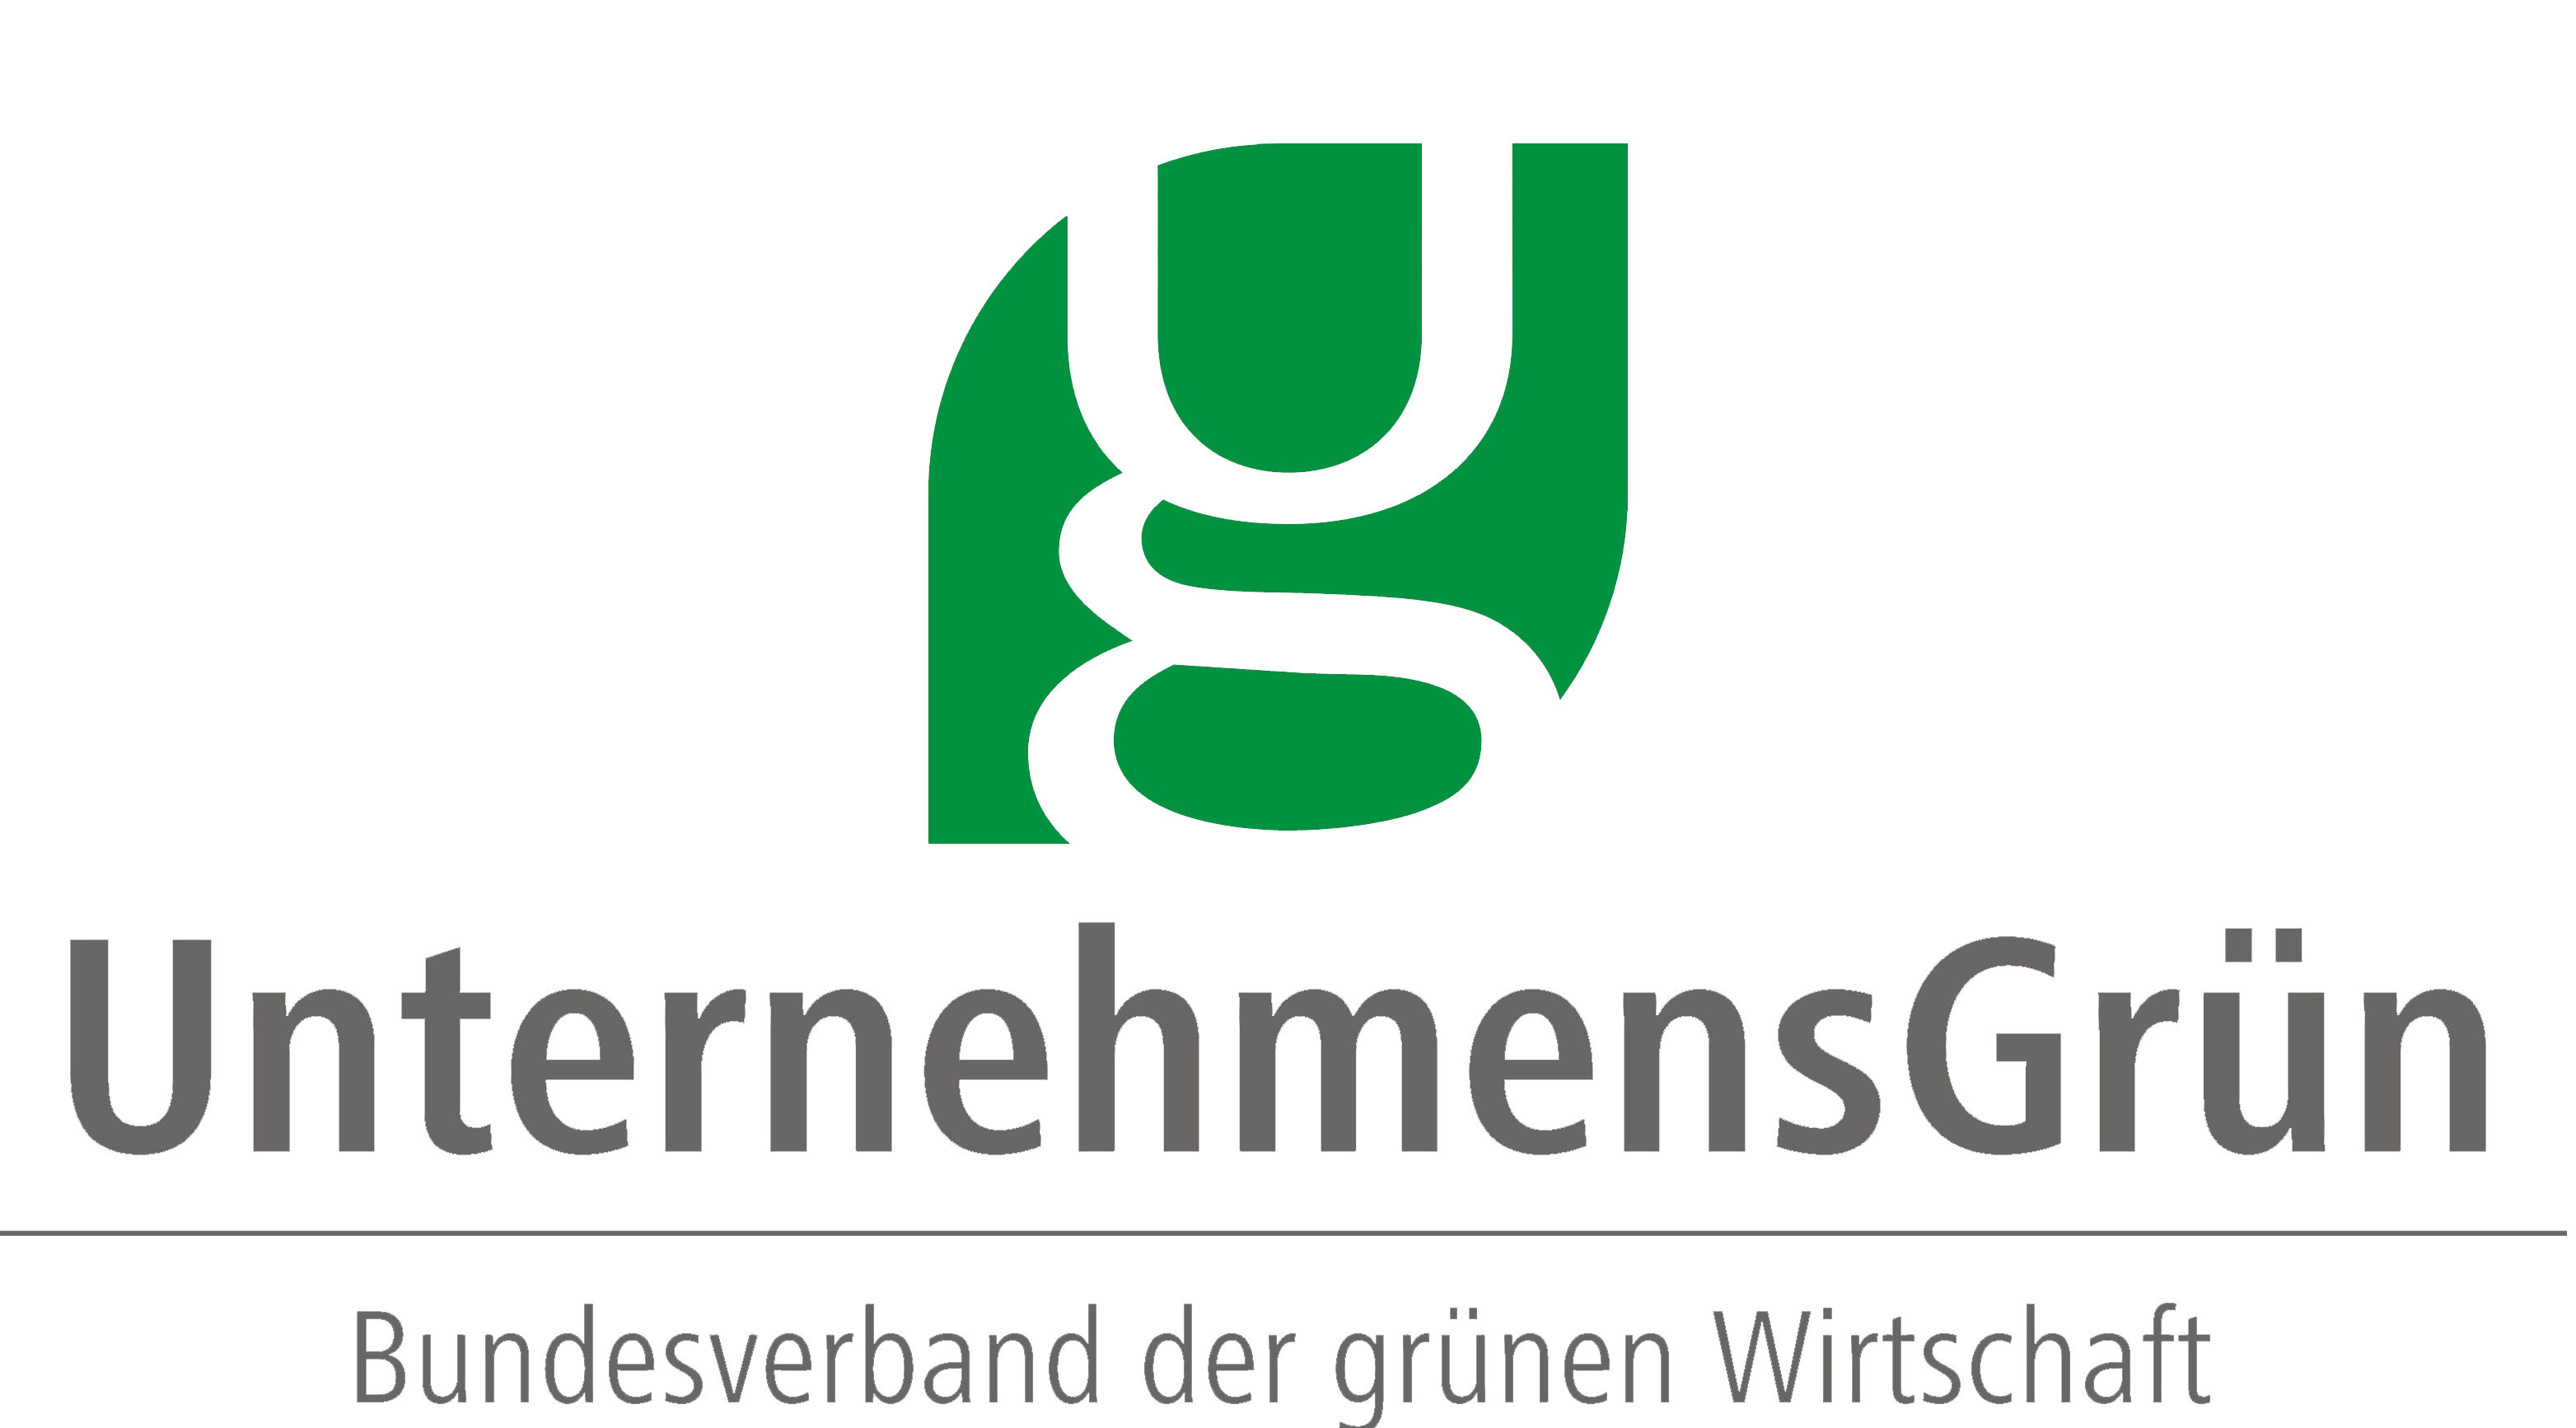 BEAUTYCALYPSE IS MEMBER OF UnternehmensGrün